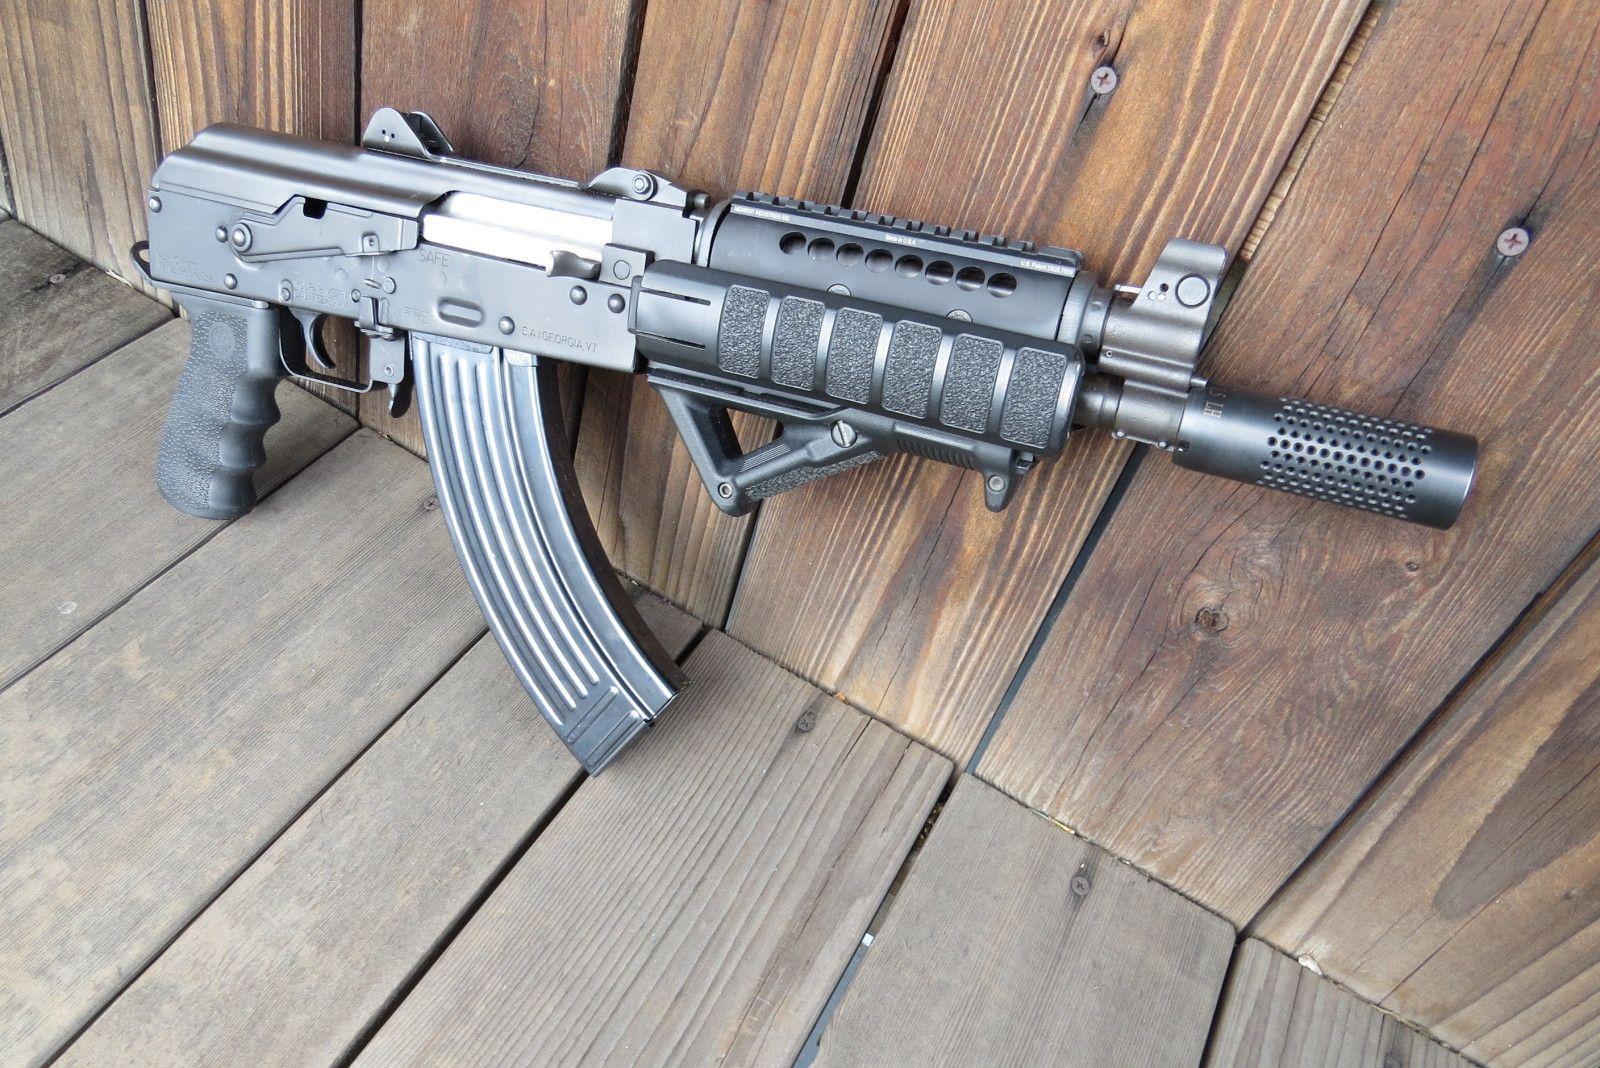 ak 47 muzzle brake   Re: DIY - Zastava M92 Muzzle Detent and